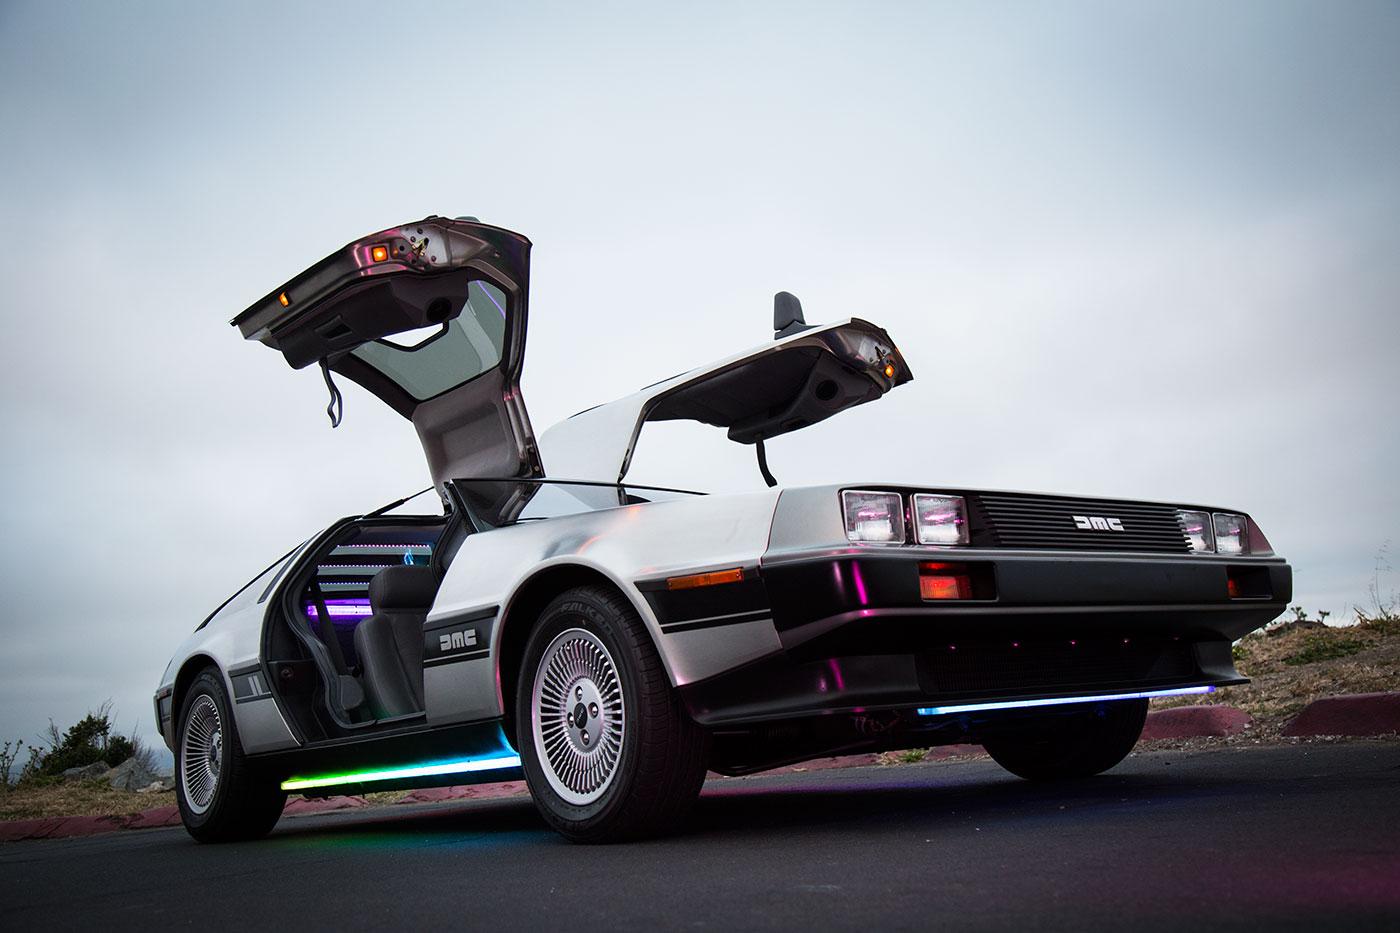 Gumball 3000 & The DMC DeLorean - CODAworx